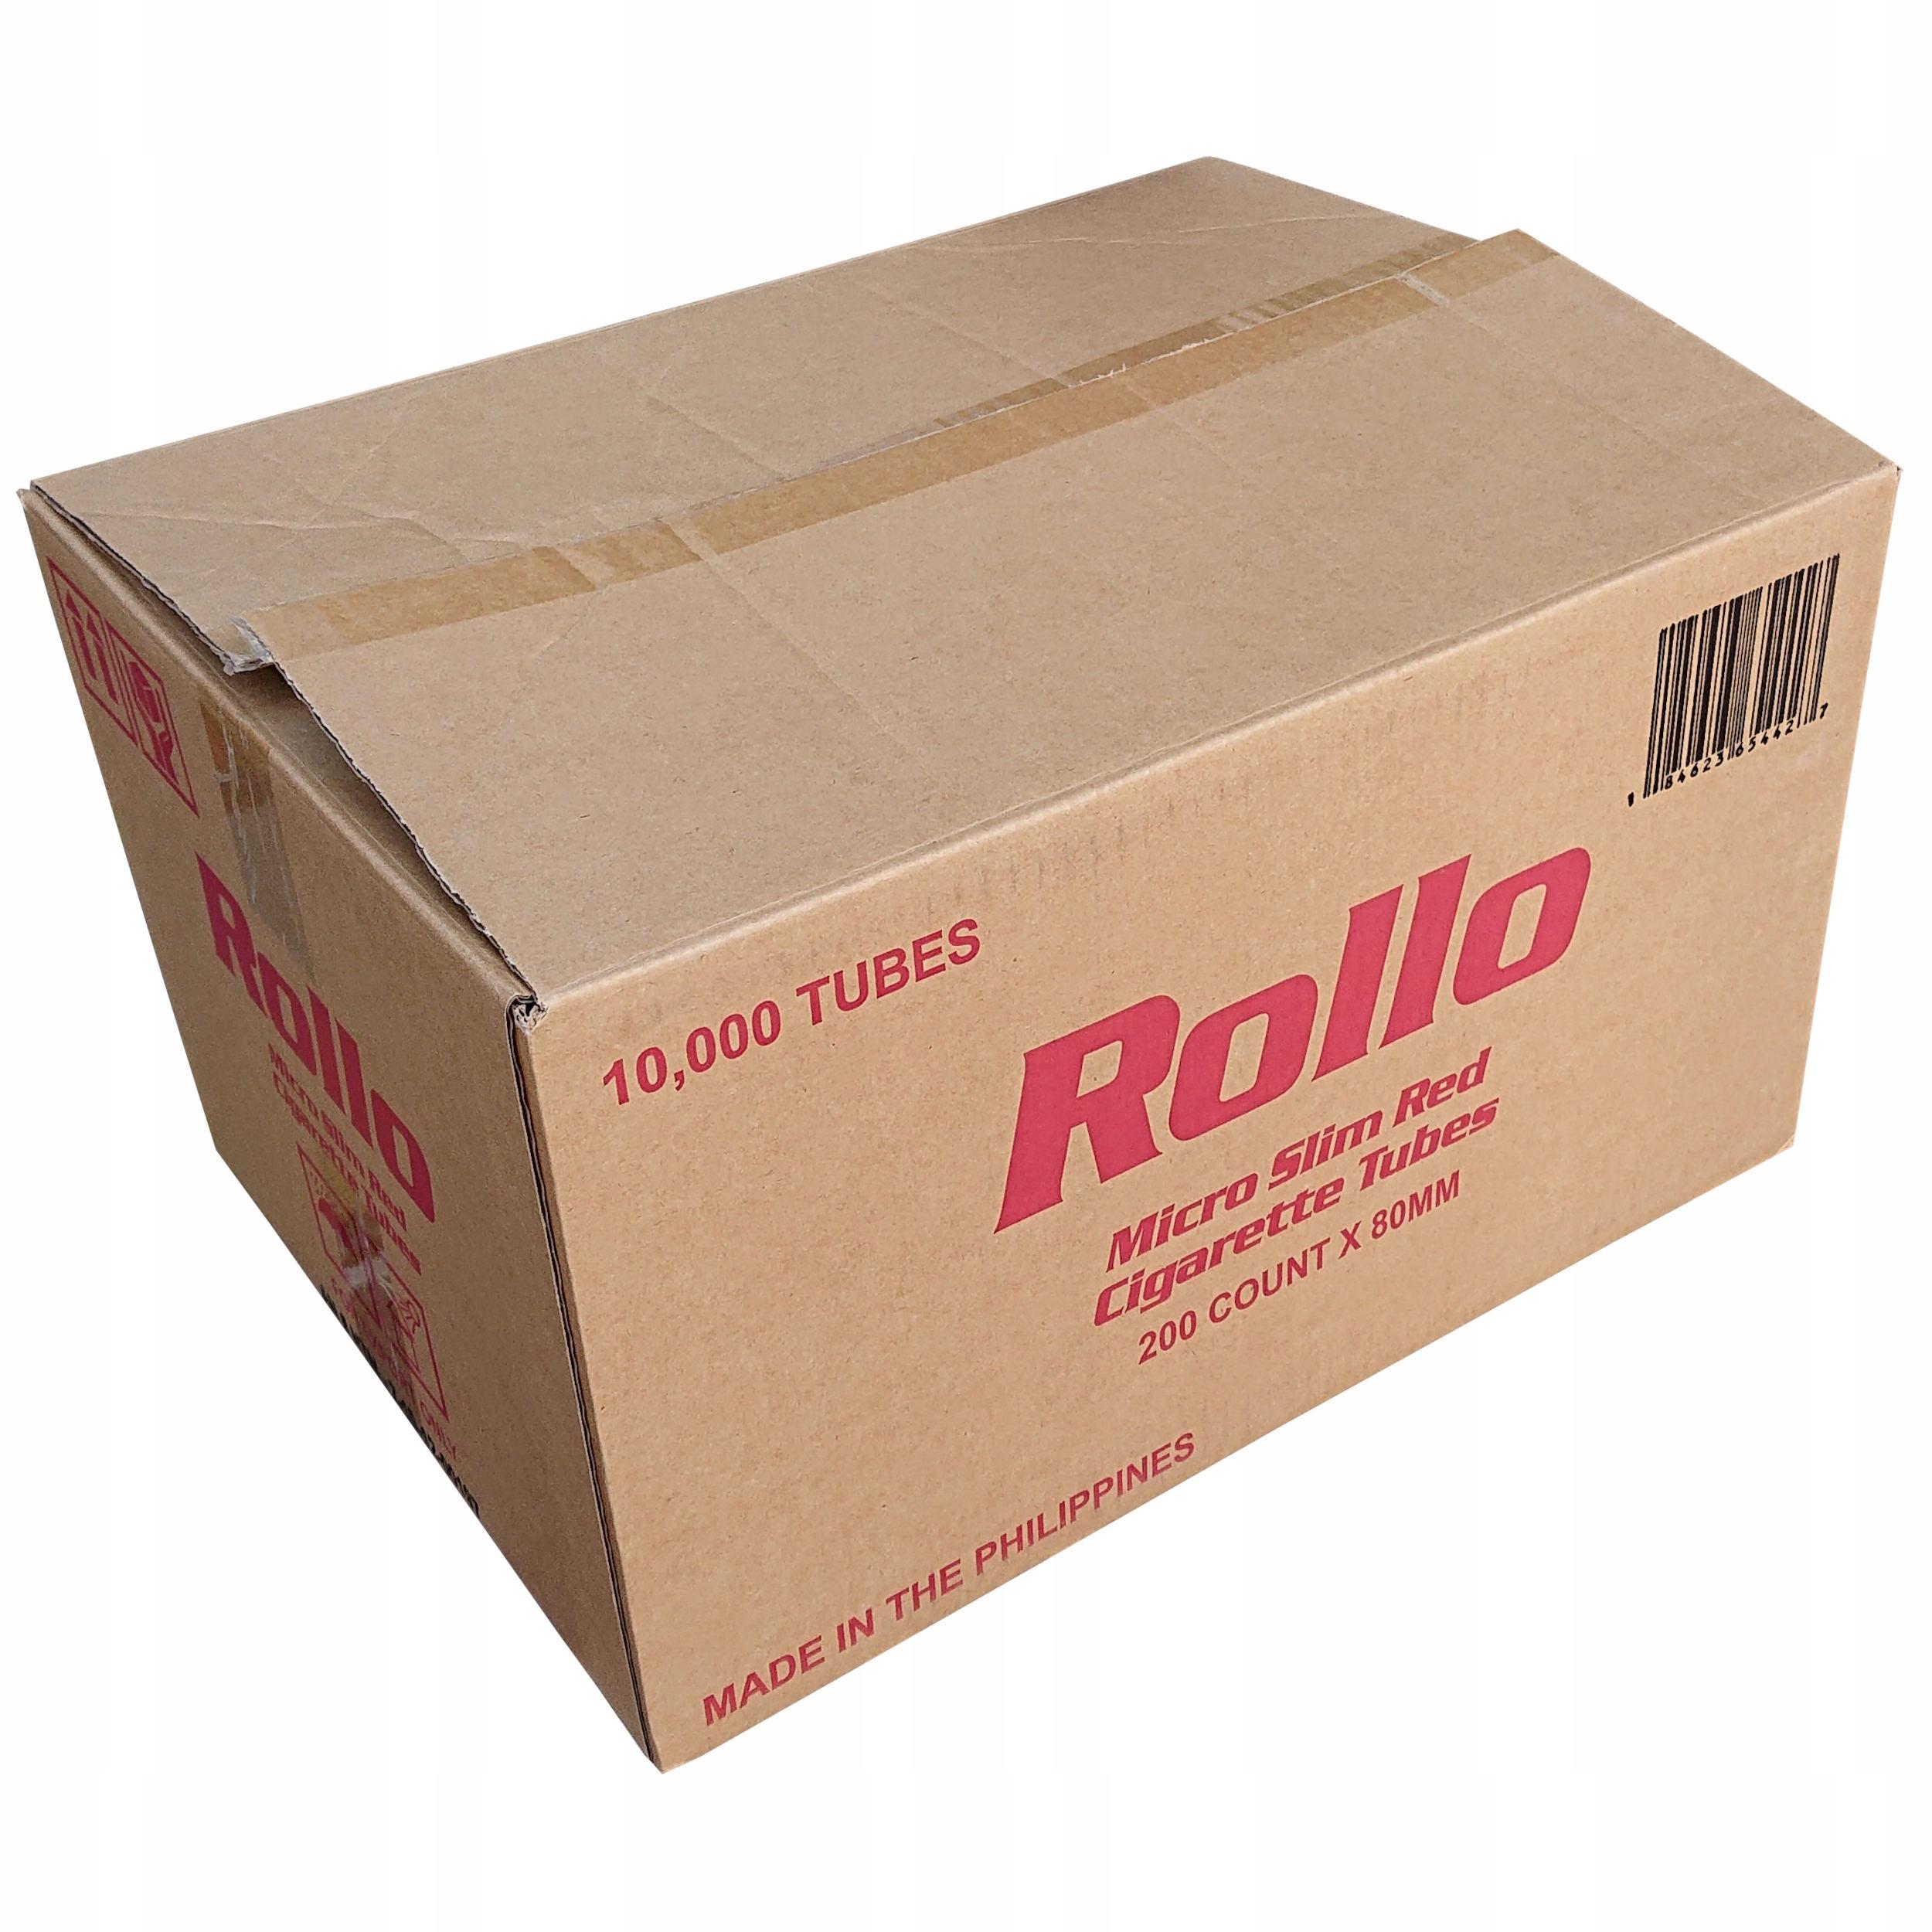 50 наперстков Rollo Micro Slim Red 200 шт. Самые тонкие